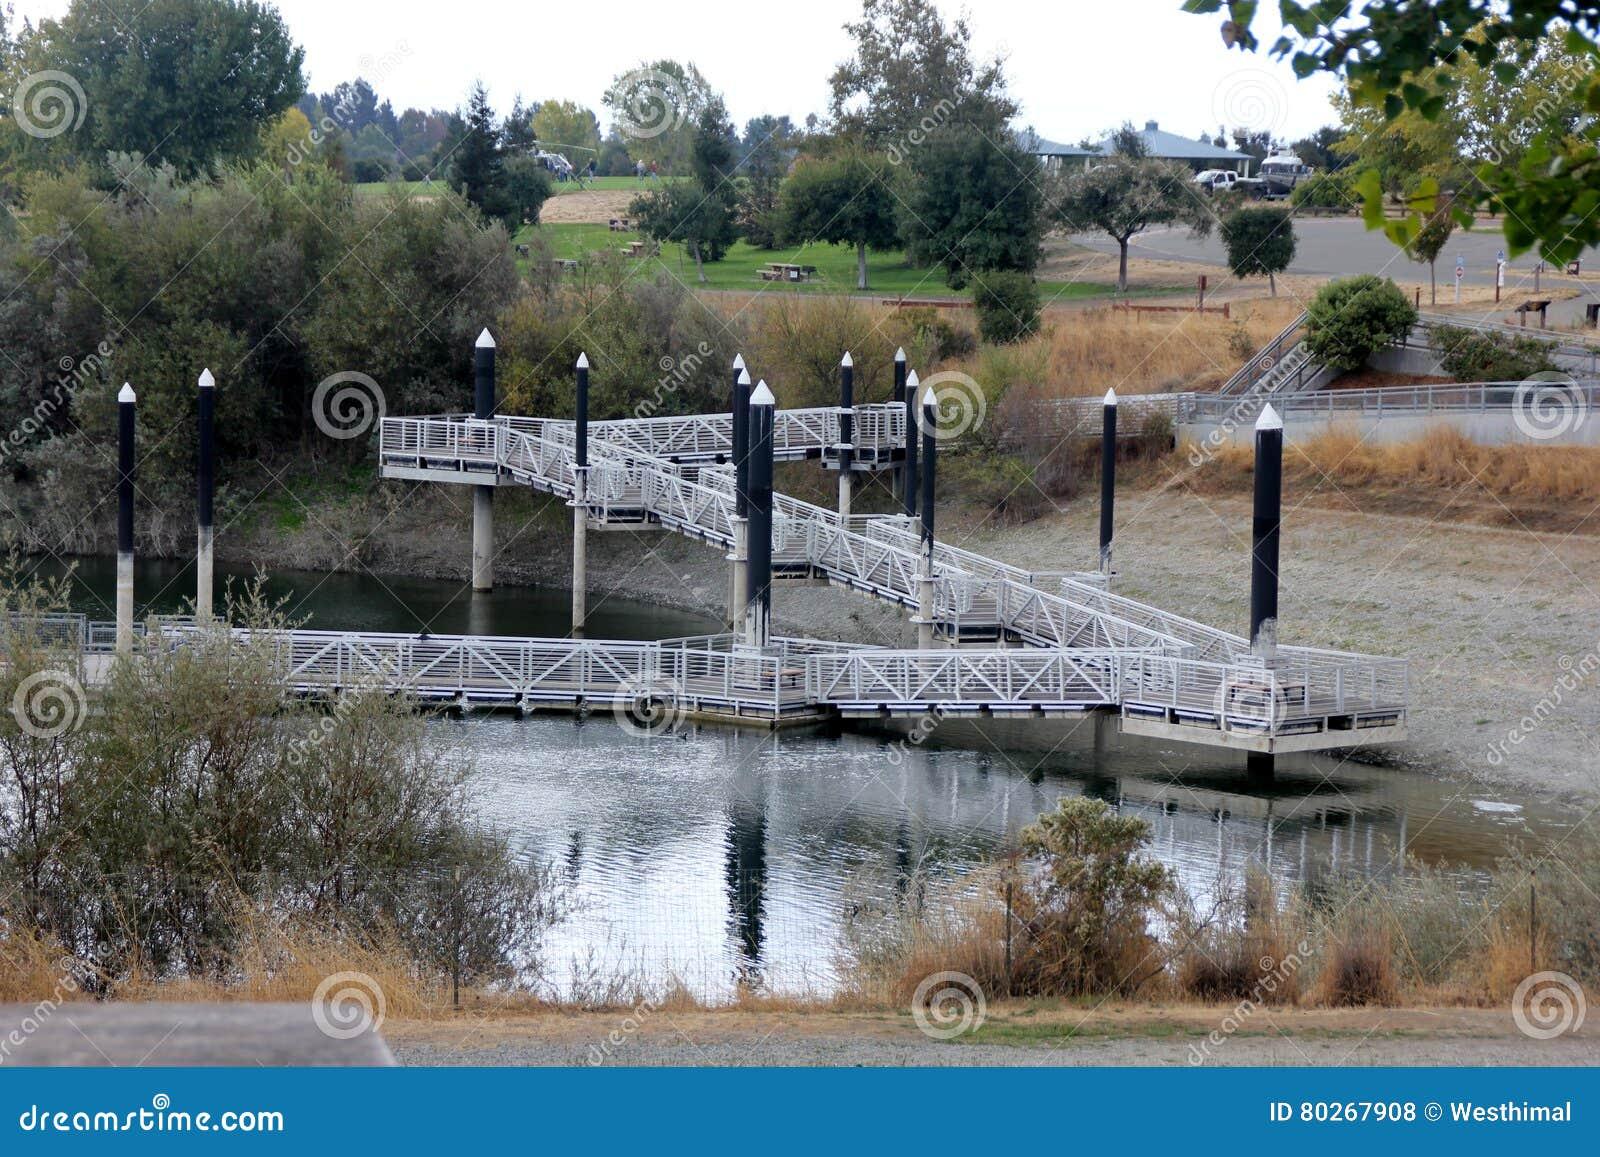 Recreational Area Of Quarry Lake, Fremont, California Stock Photo